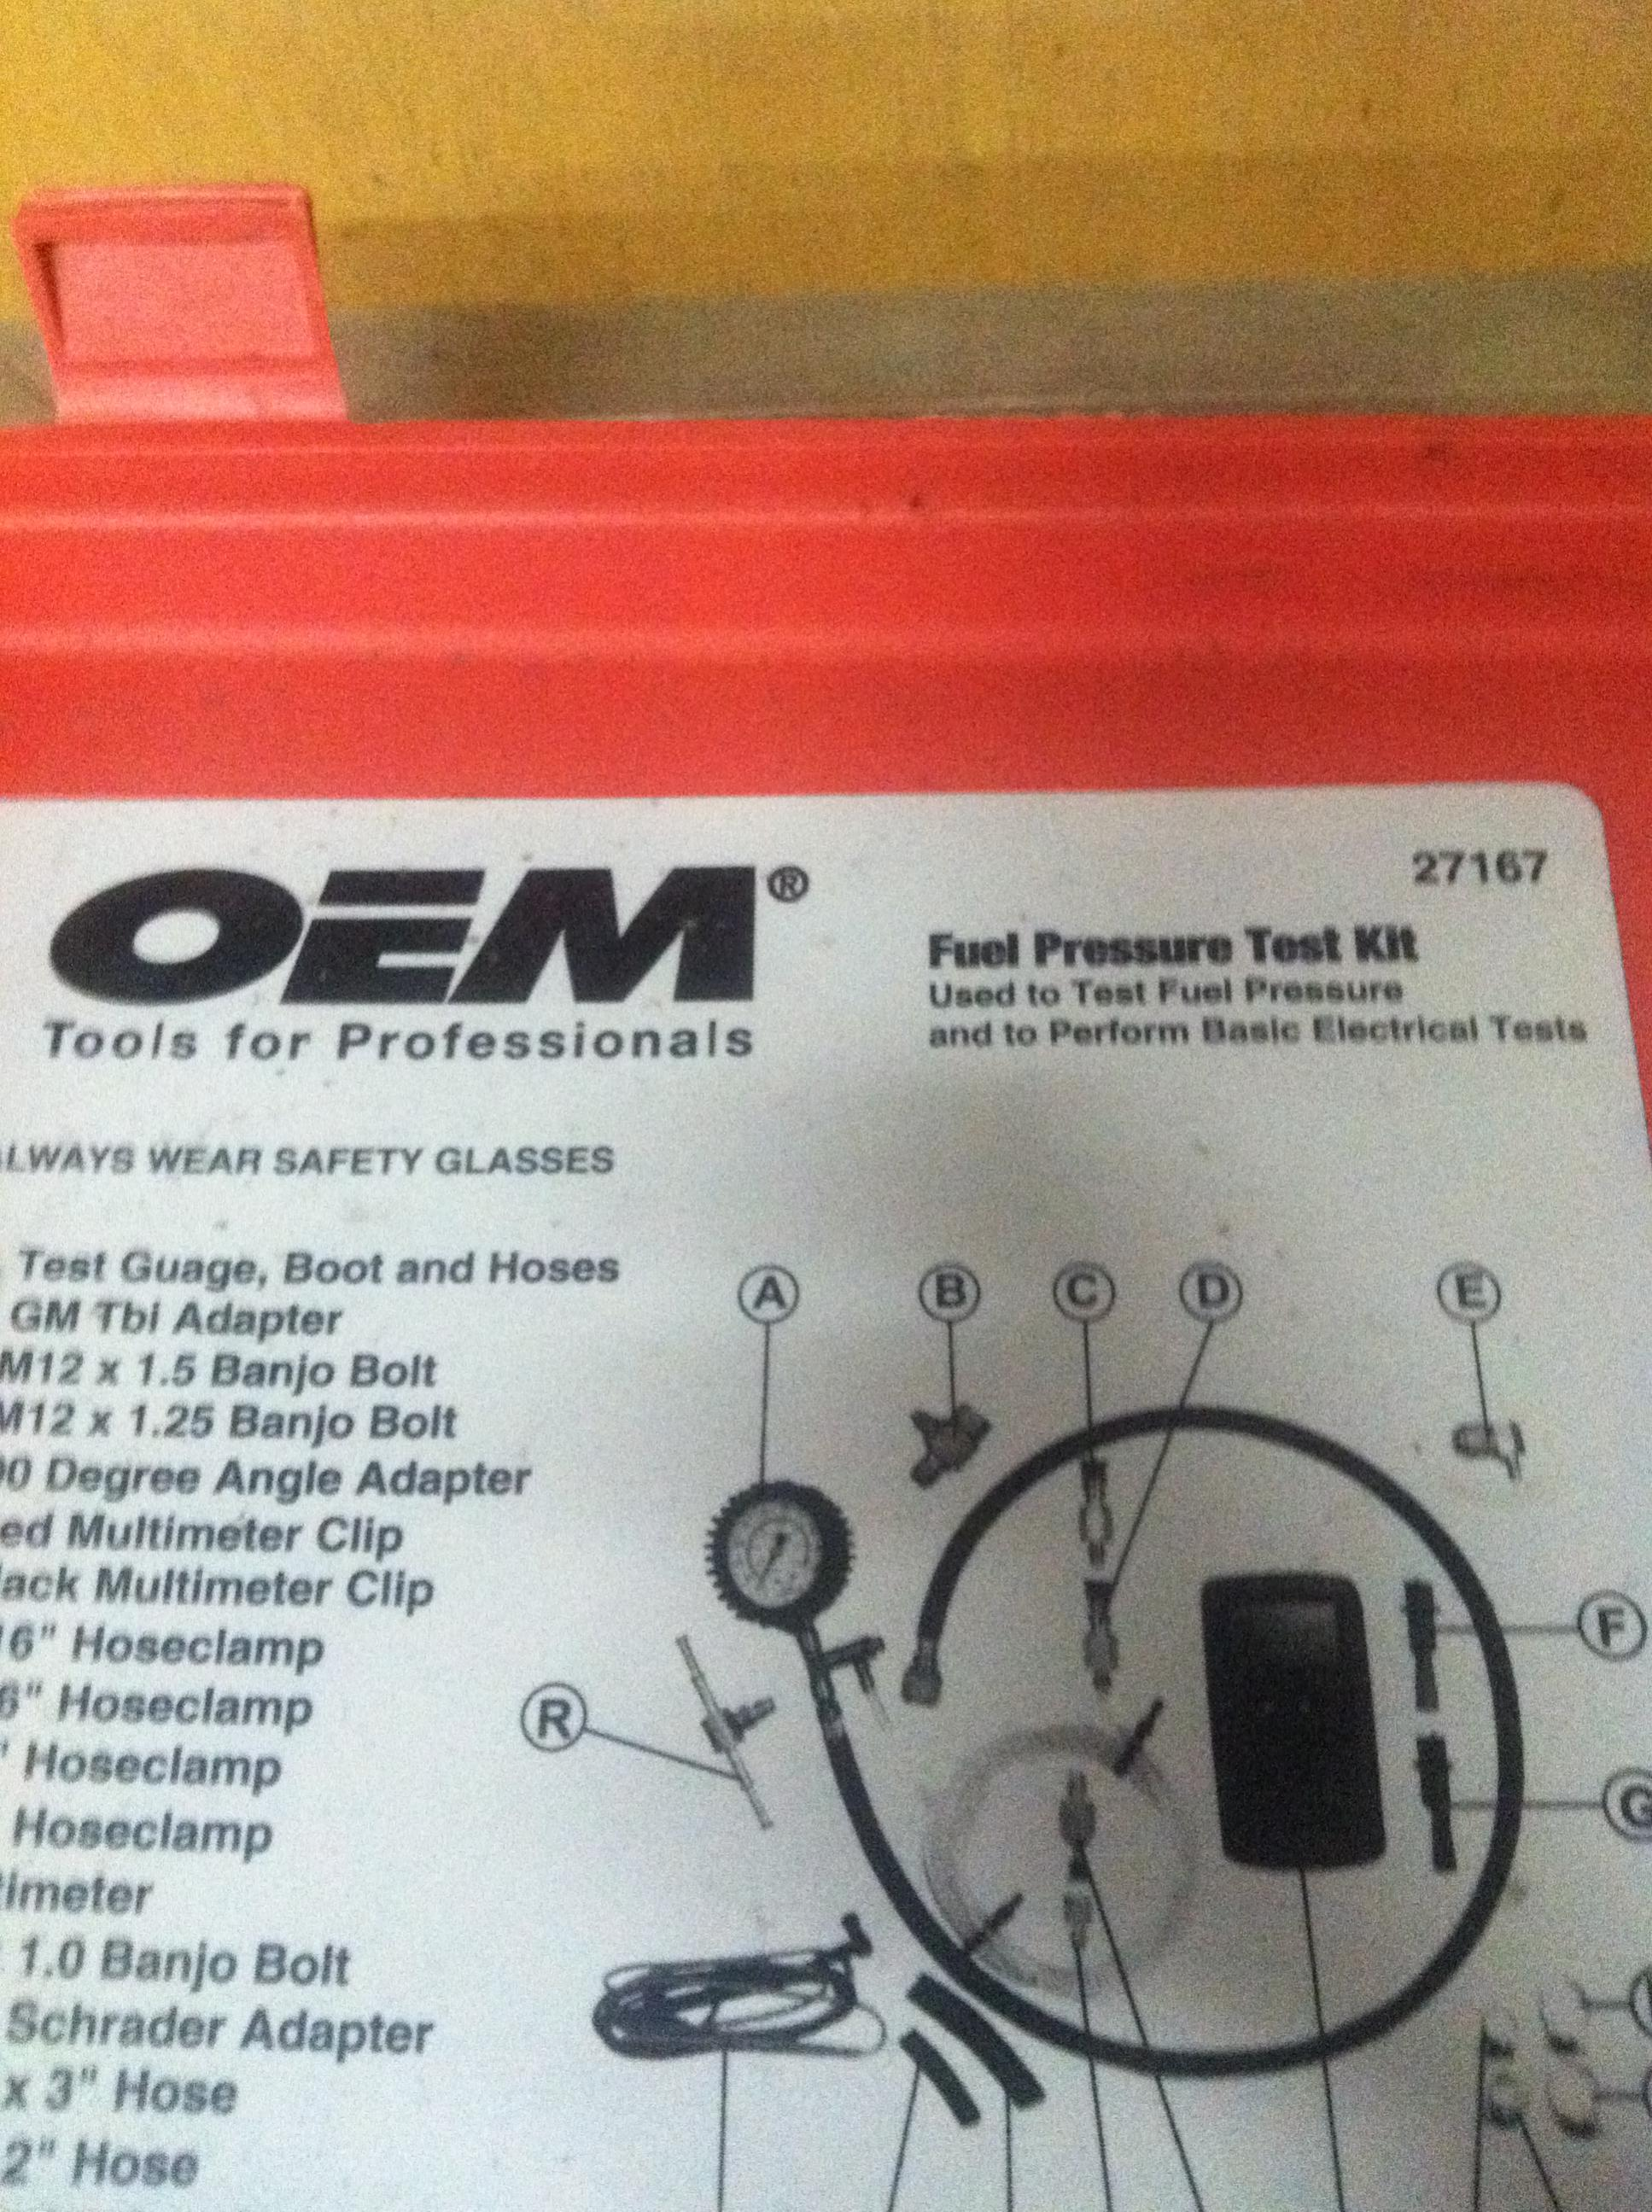 What To Use To Test Fuel Preasure Kawasaki Teryx Forum